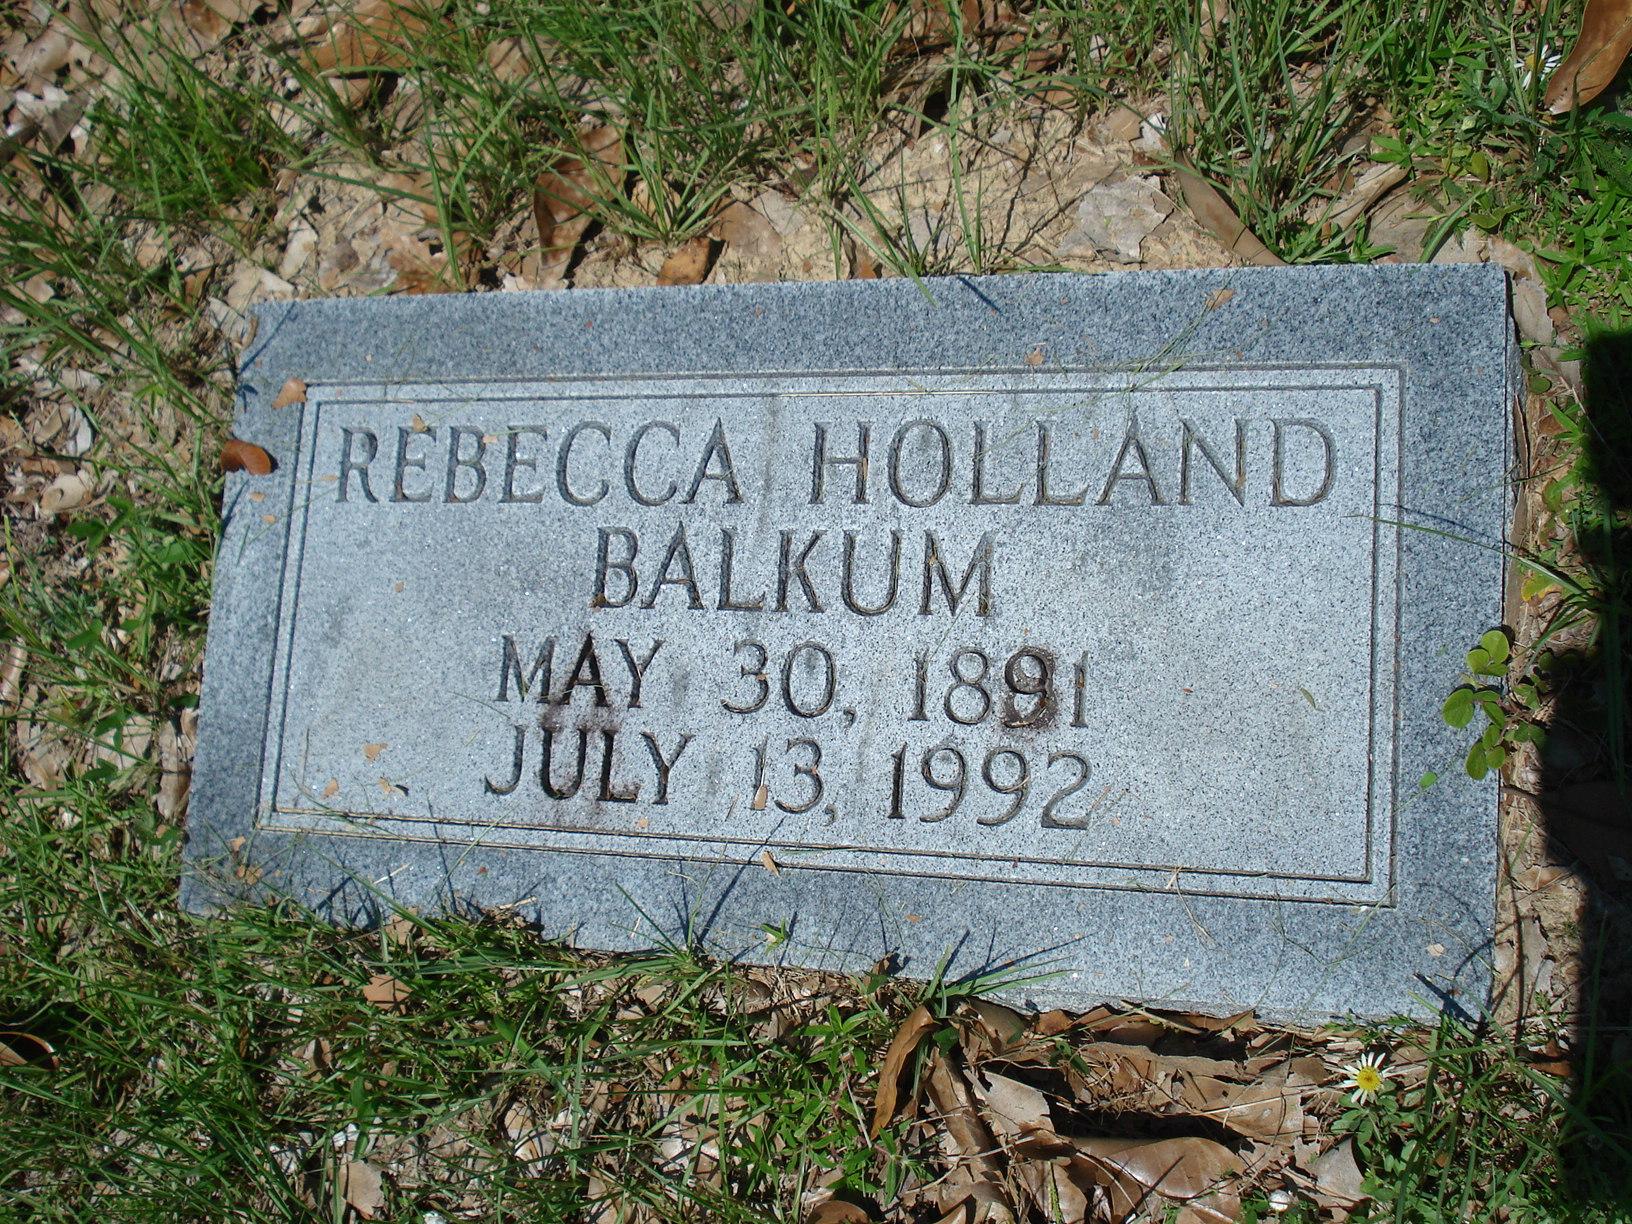 Rebecca Holland Balkum